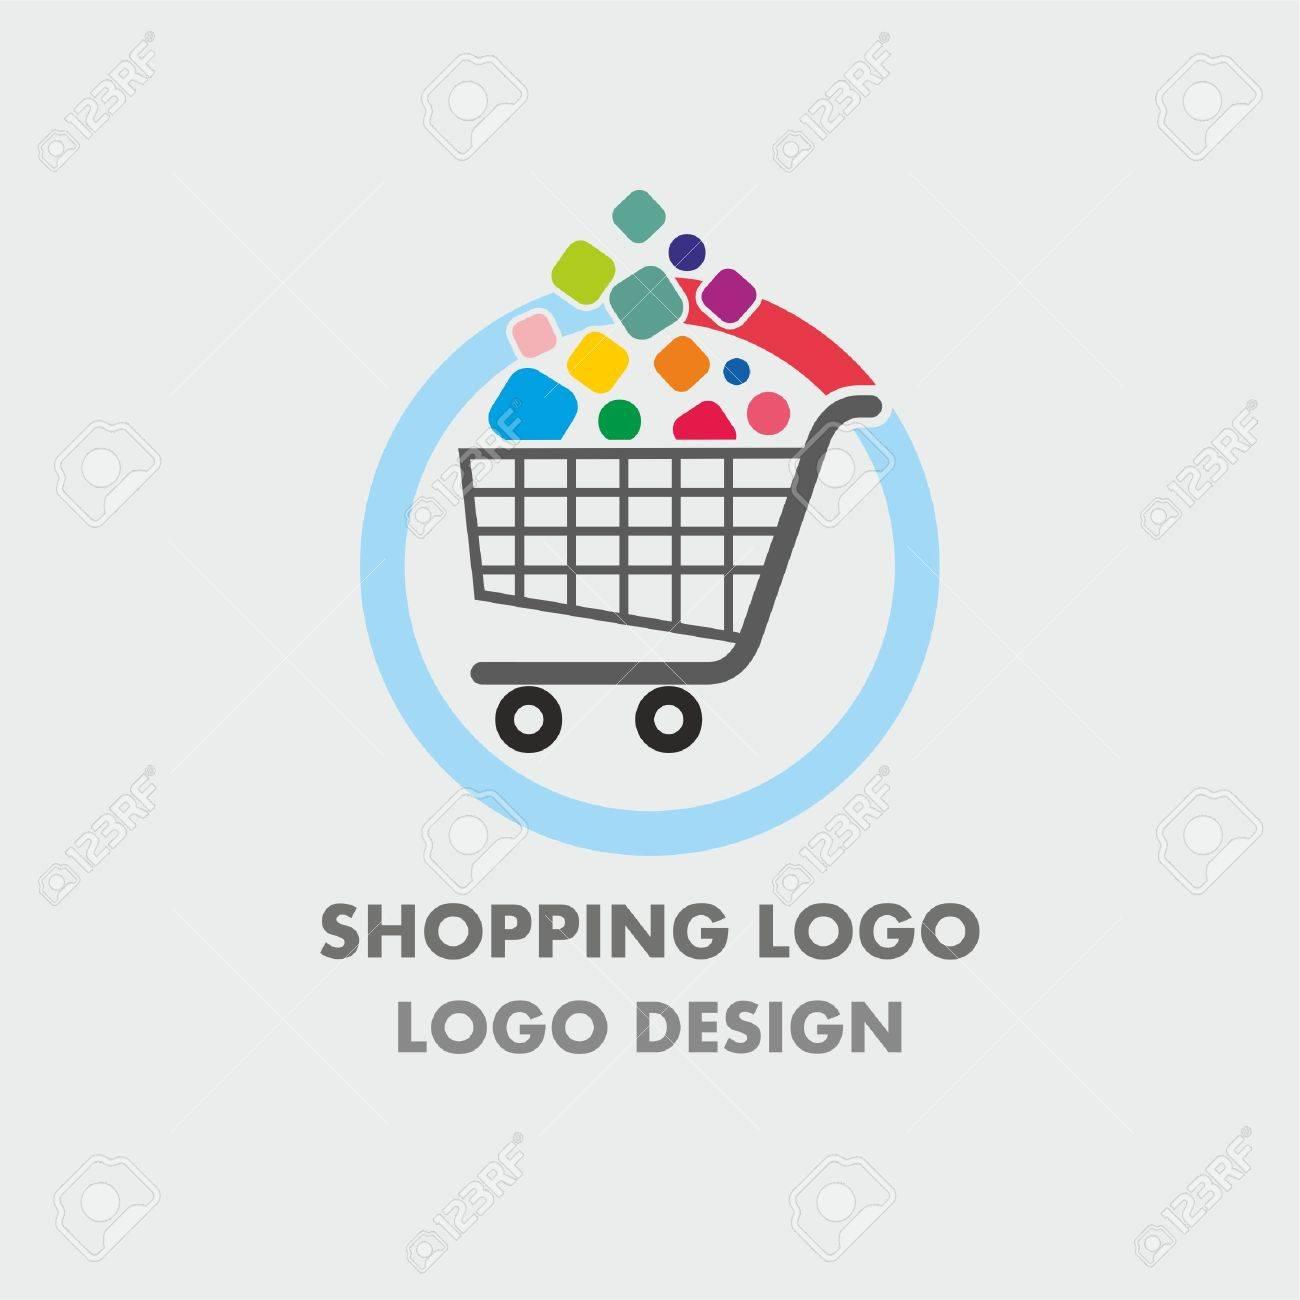 abstract shopping cart logo